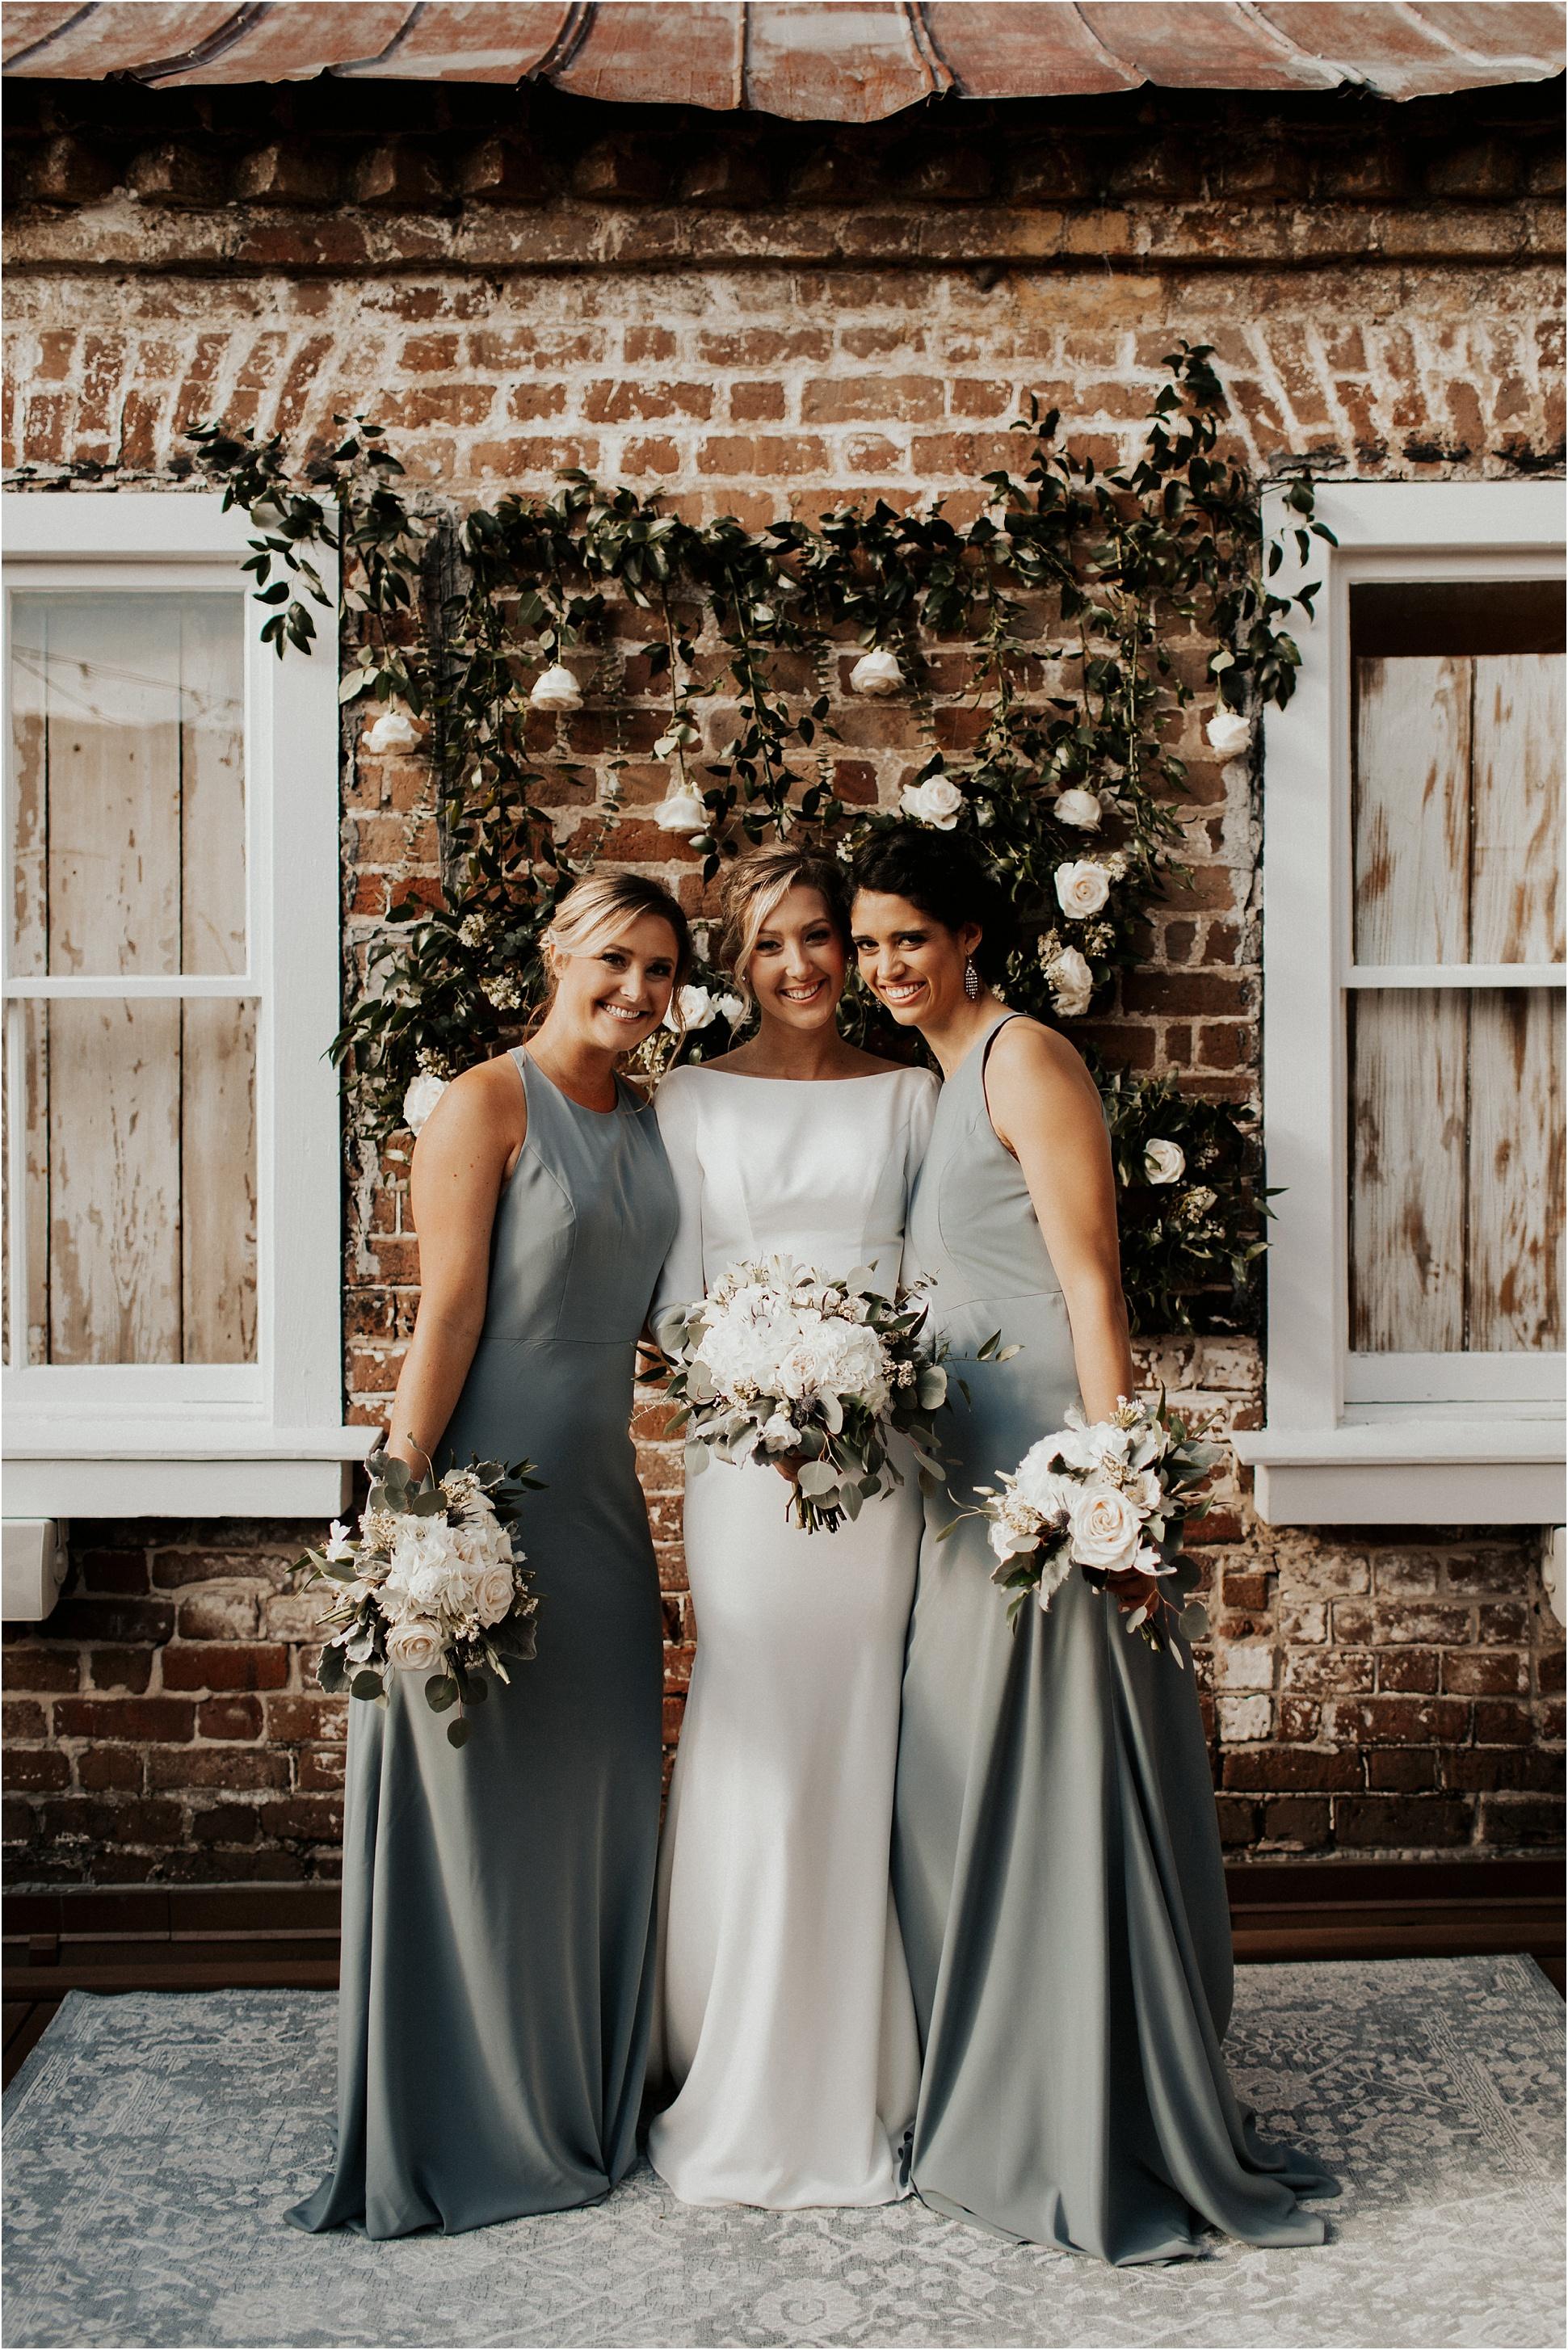 upstairs_midtown_intimate_charleston_wedding020.JPG